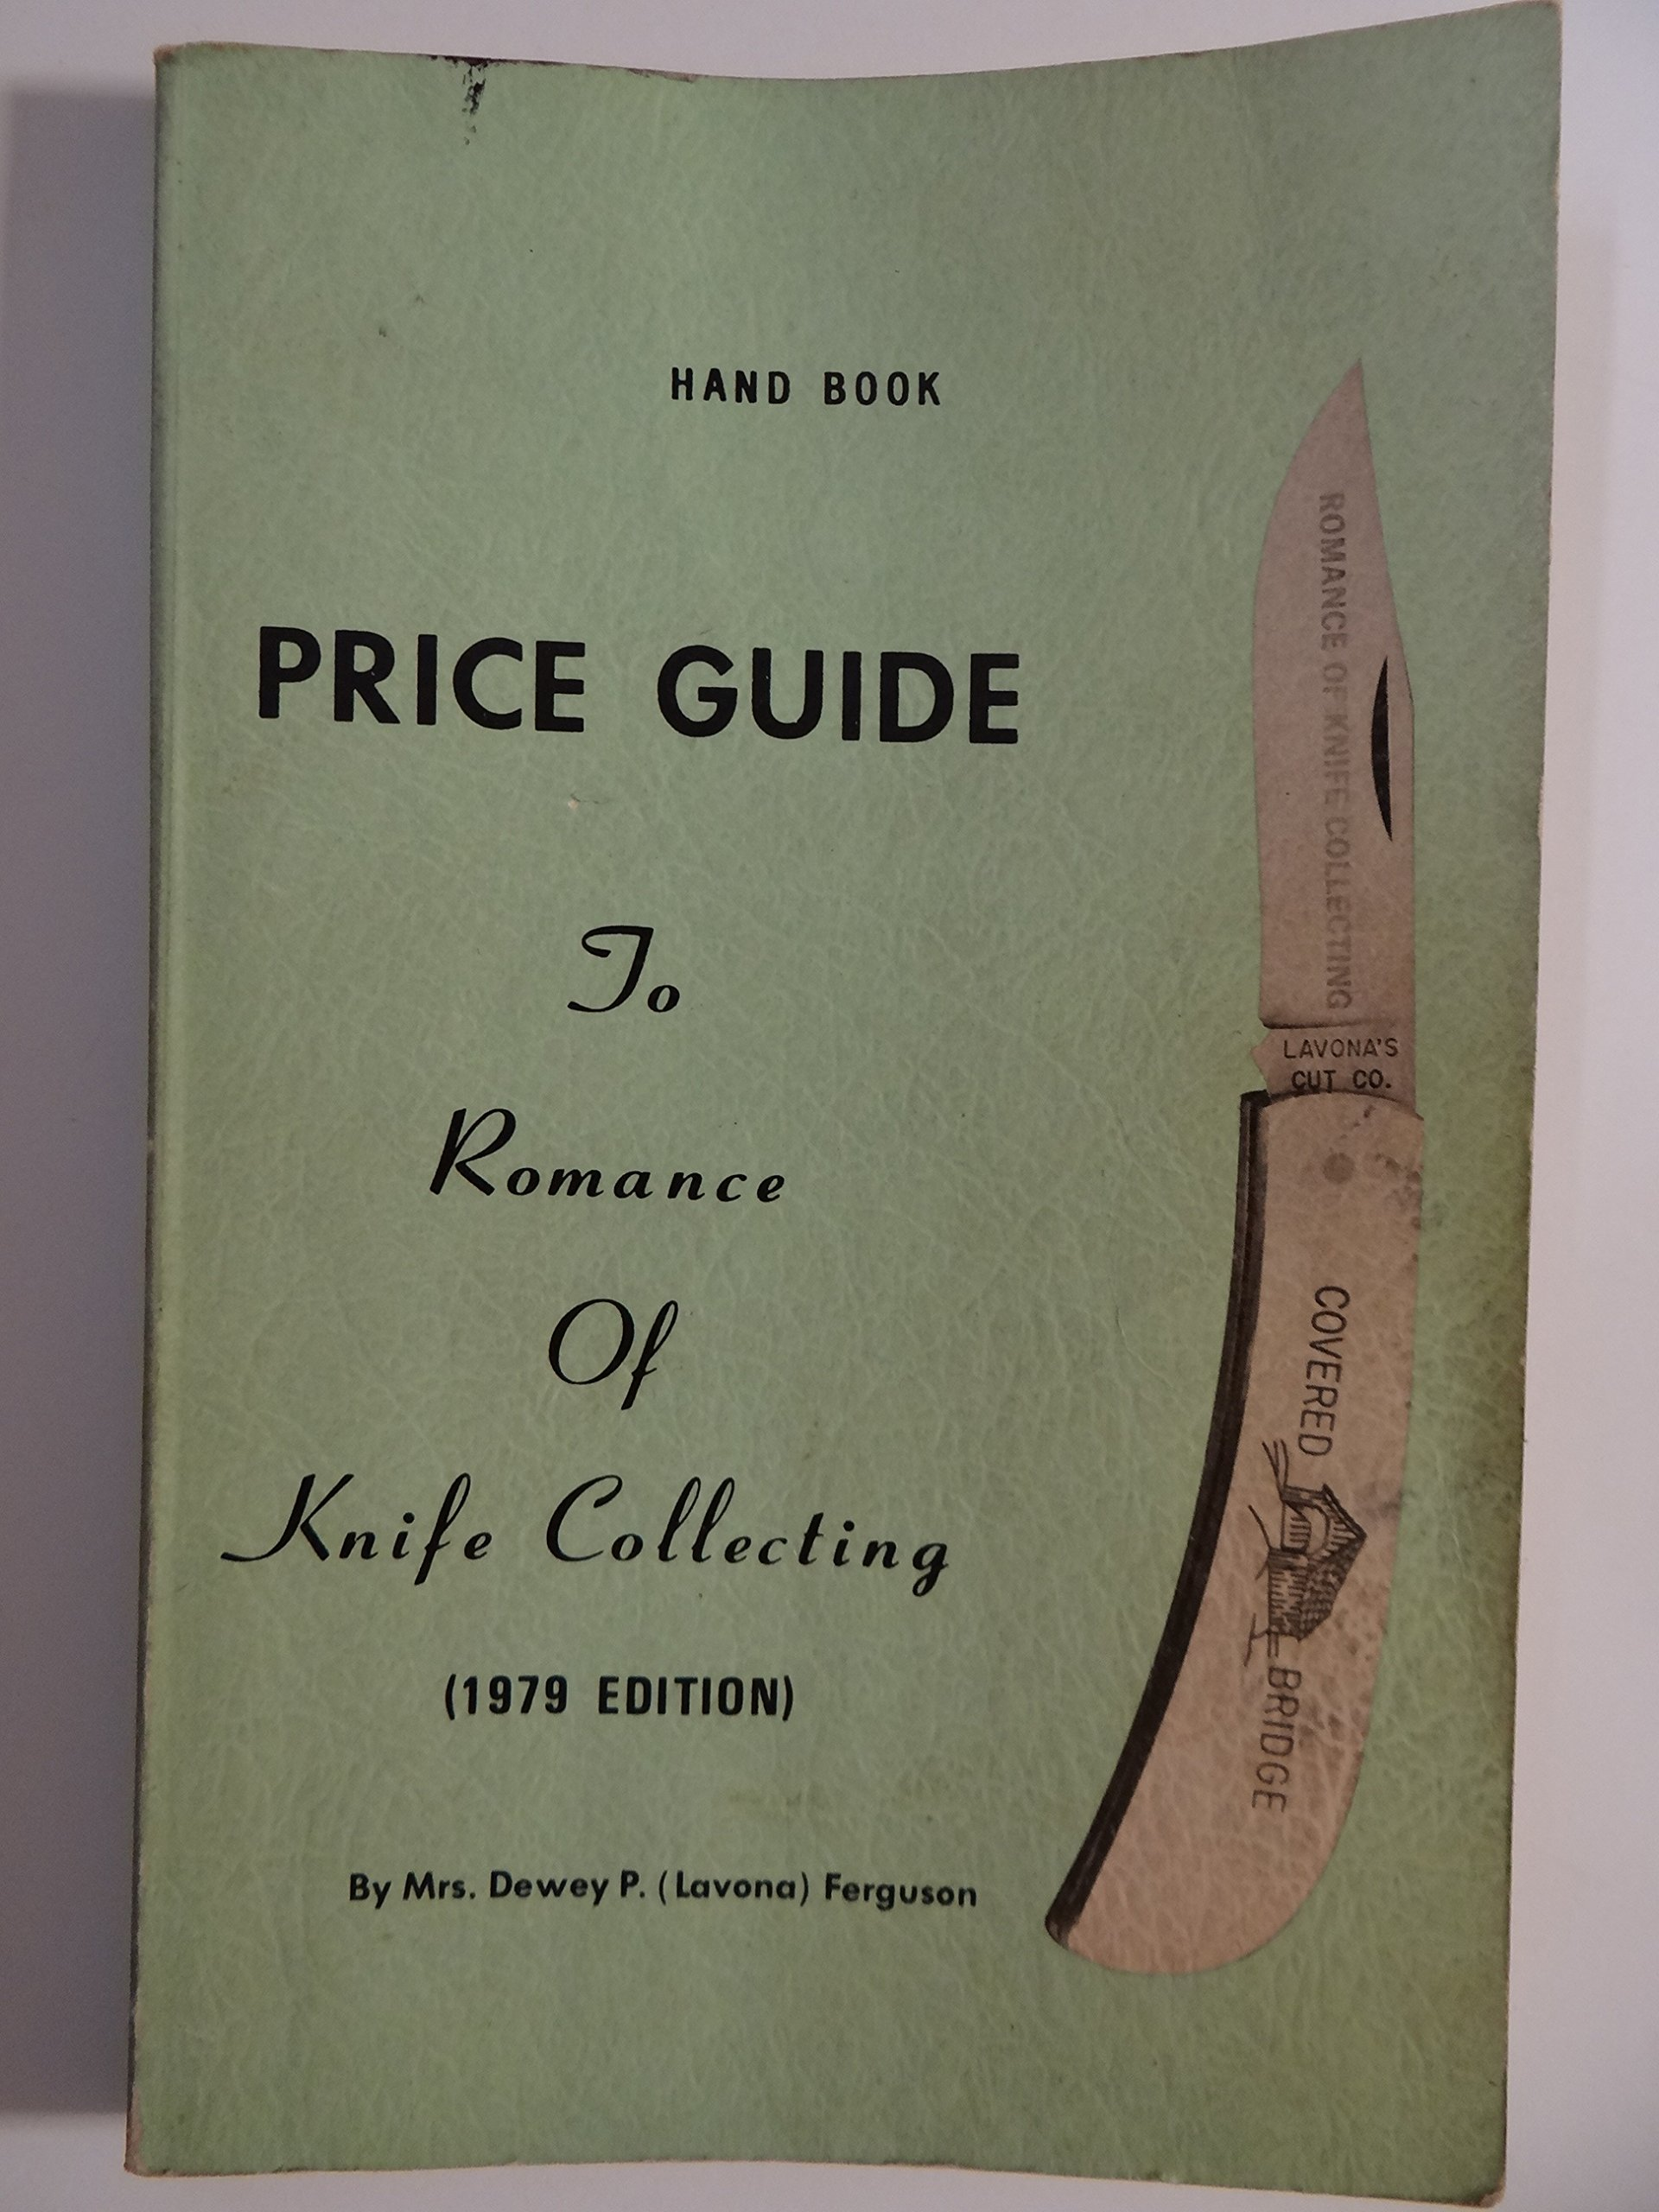 Hand Book Price Guide To Romance Of Knife Collecting (1979 Edition): Mrs.  Dewey P. (Lavona) Ferguson: Amazon.com: Books